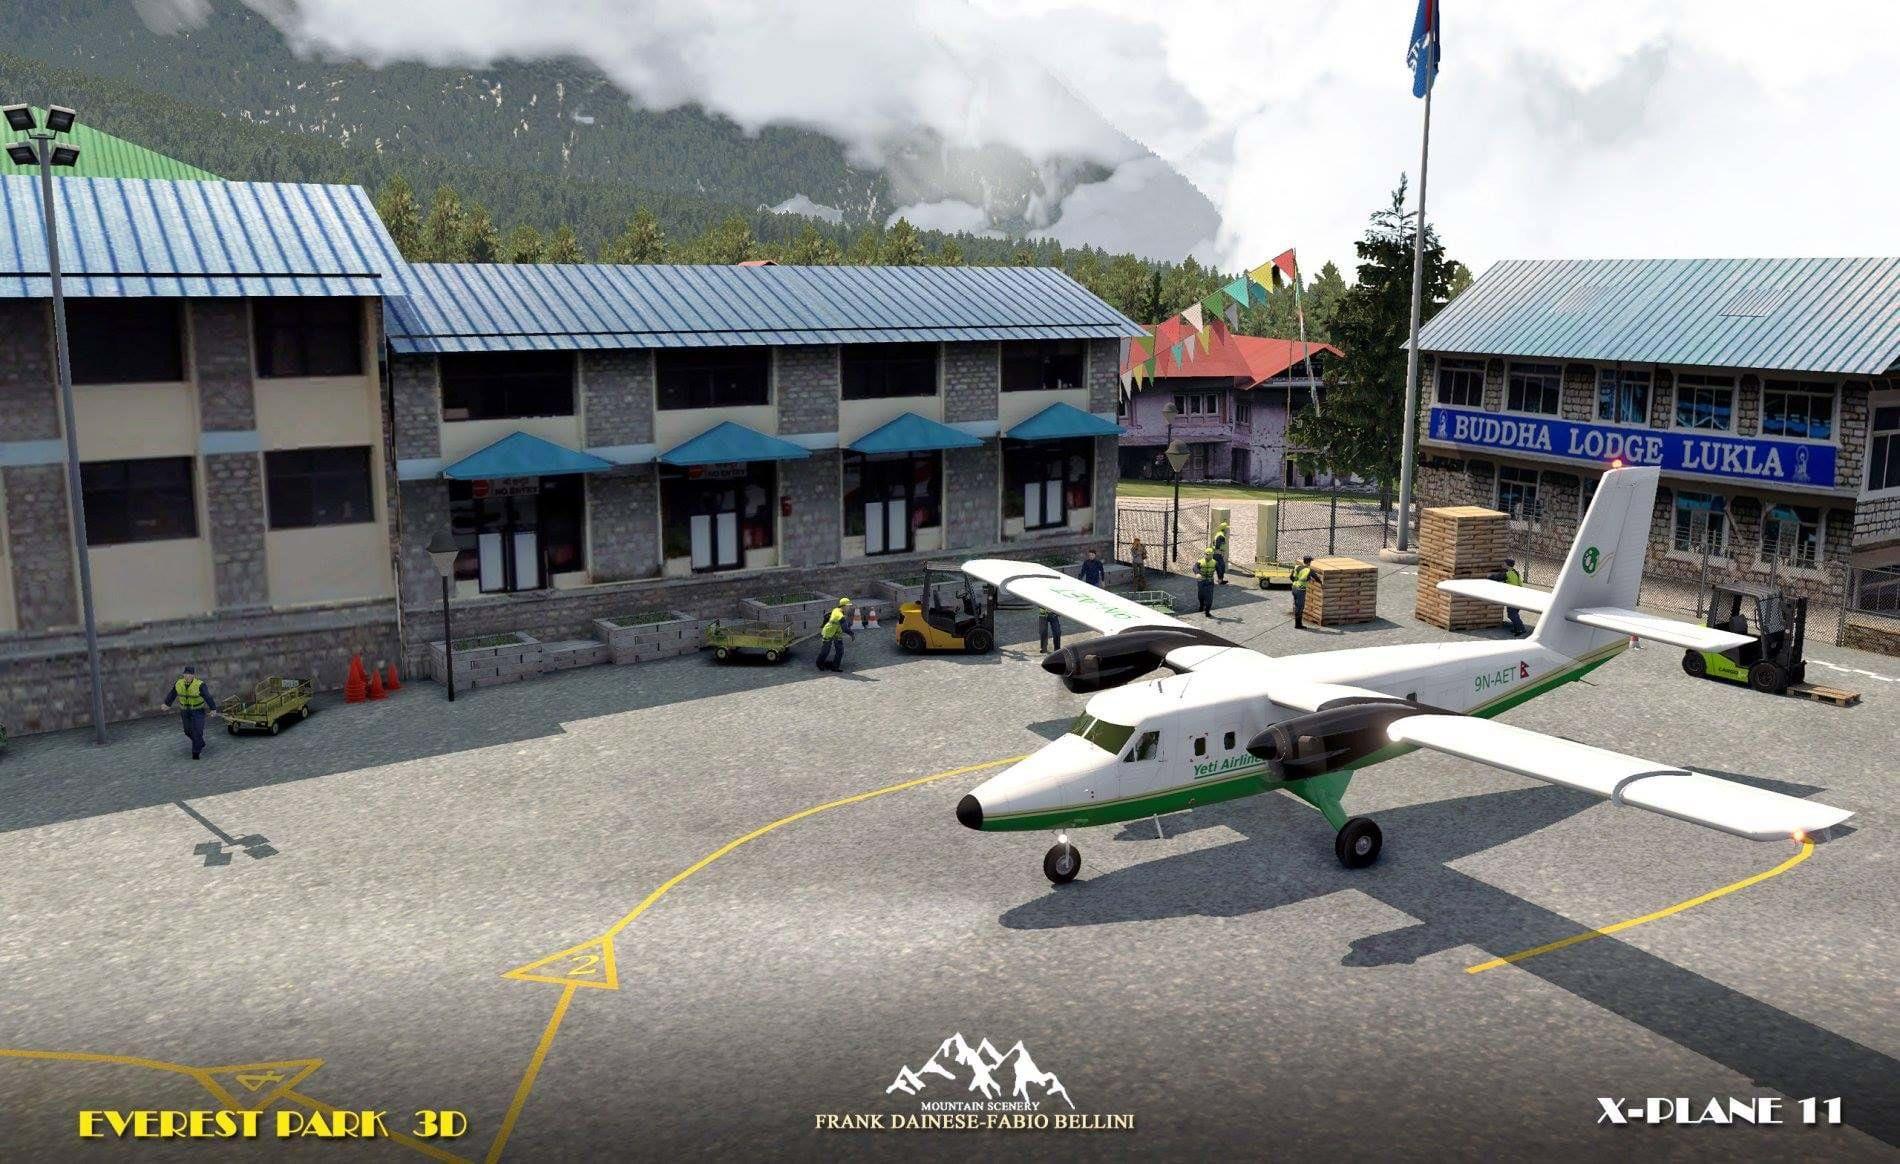 Men at work: Frank Dainese shows progress on Lukla for X-Plane